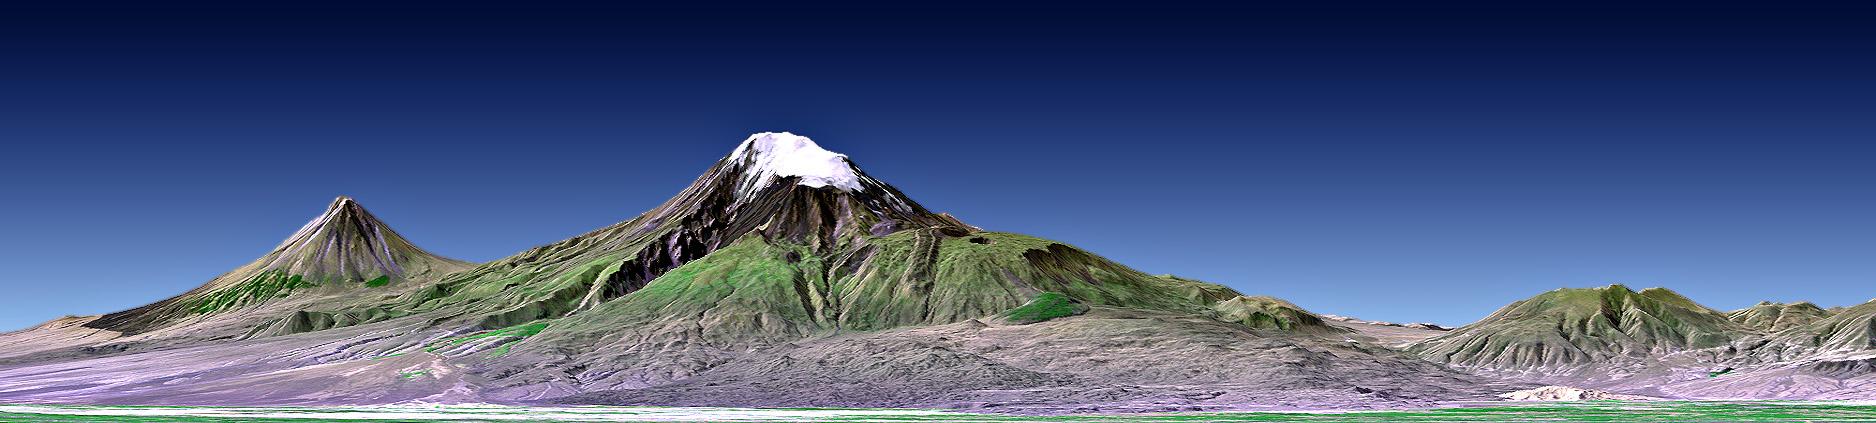 Arcemz/Mount Ararat - First Civilization Temple?